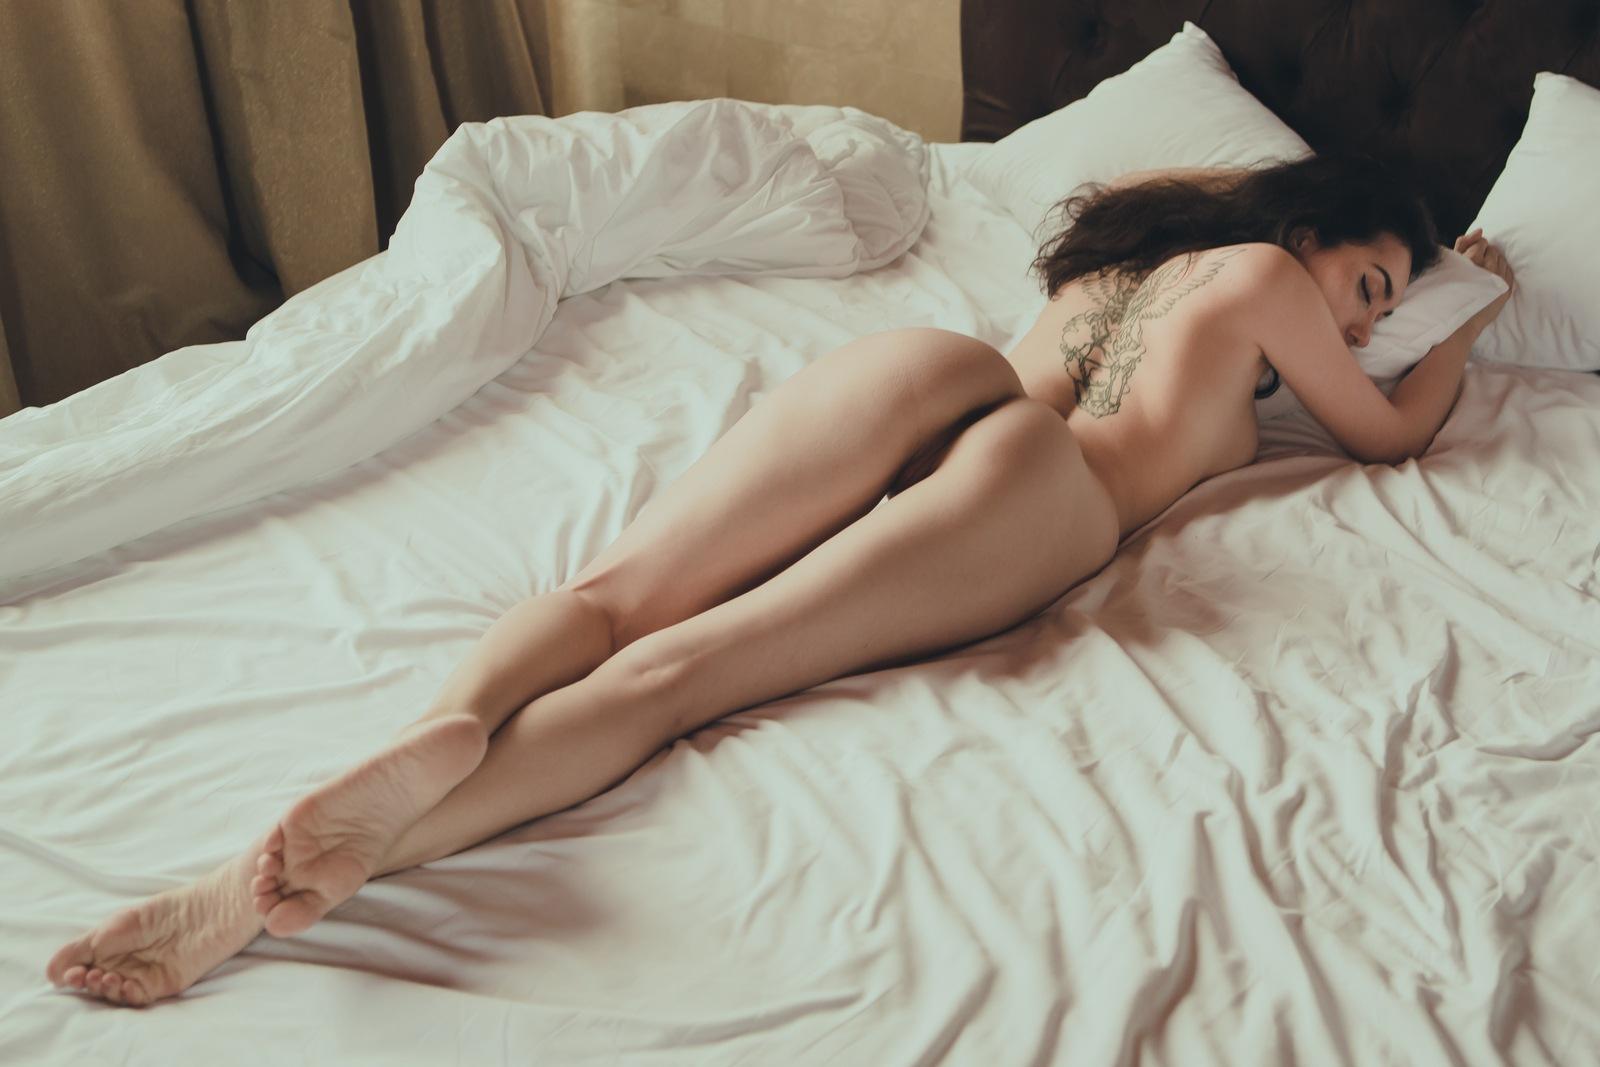 sleeping beauty by Dmitry Gabs